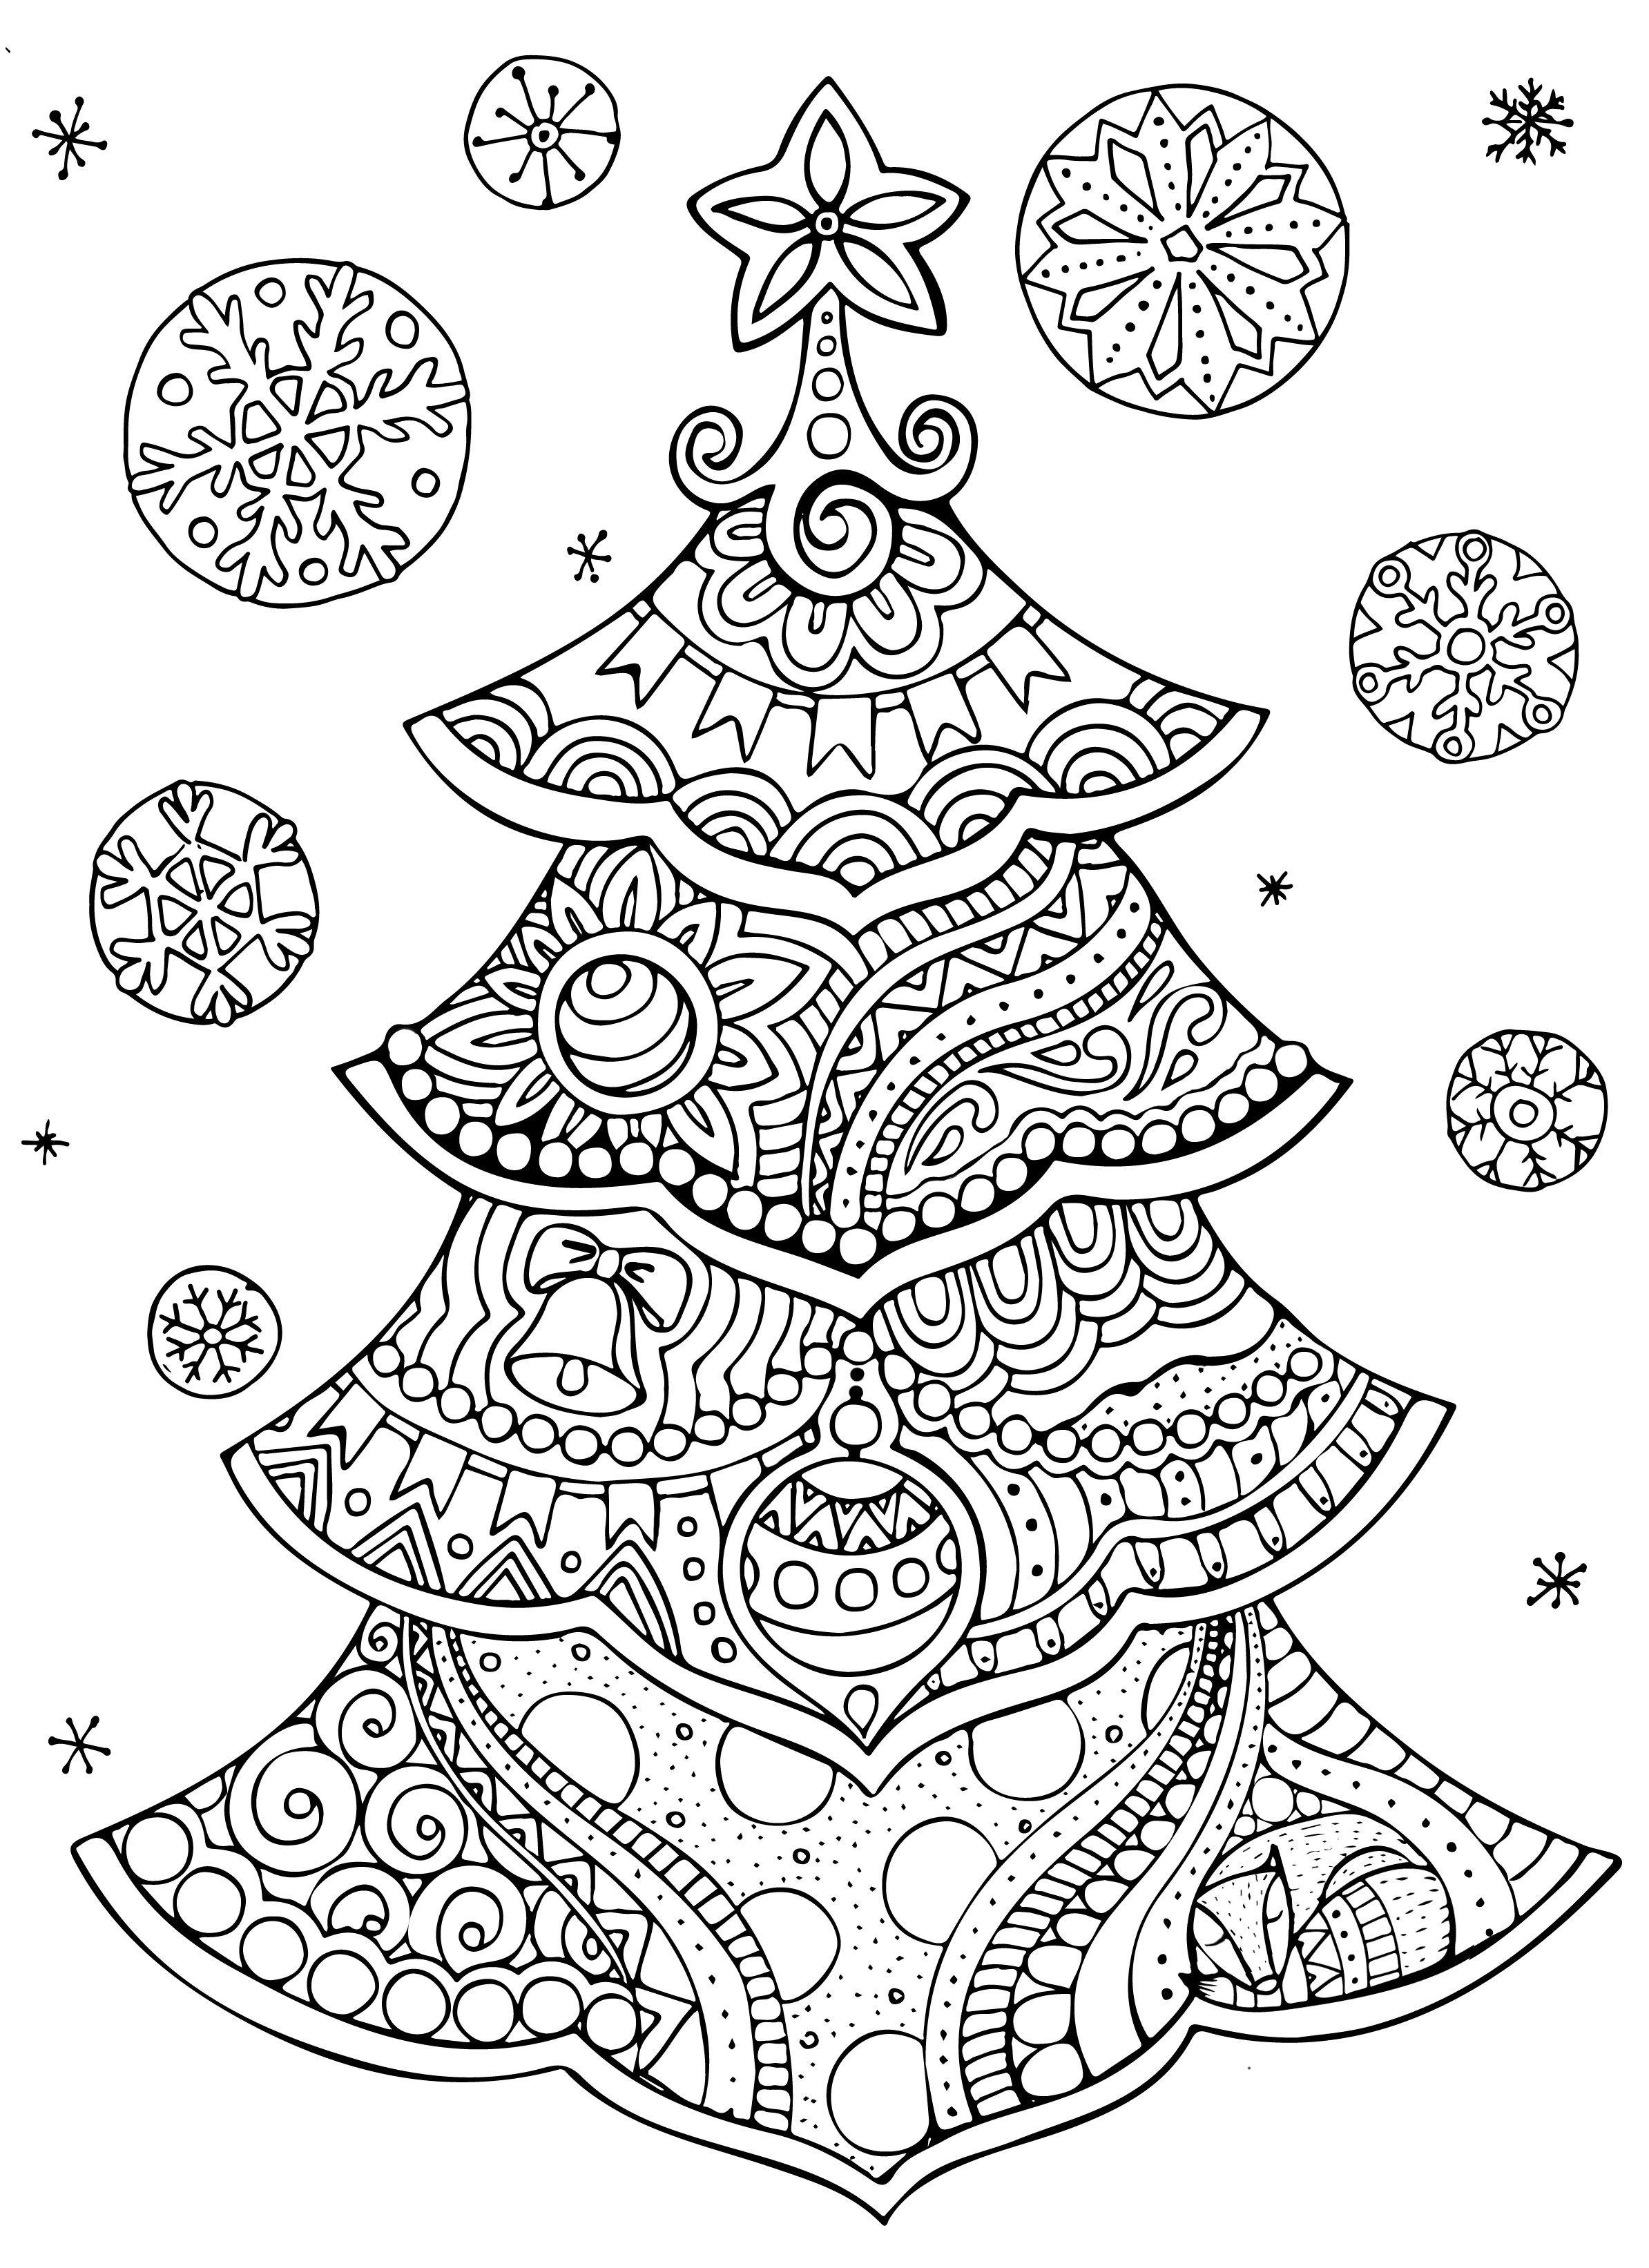 0d3b3a5b 5f71 4e66 900f 8e4641d85928 Jpg 2388 3285 Christmas Coloring Pages Printable Christmas Coloring Pages Christmas Coloring Books